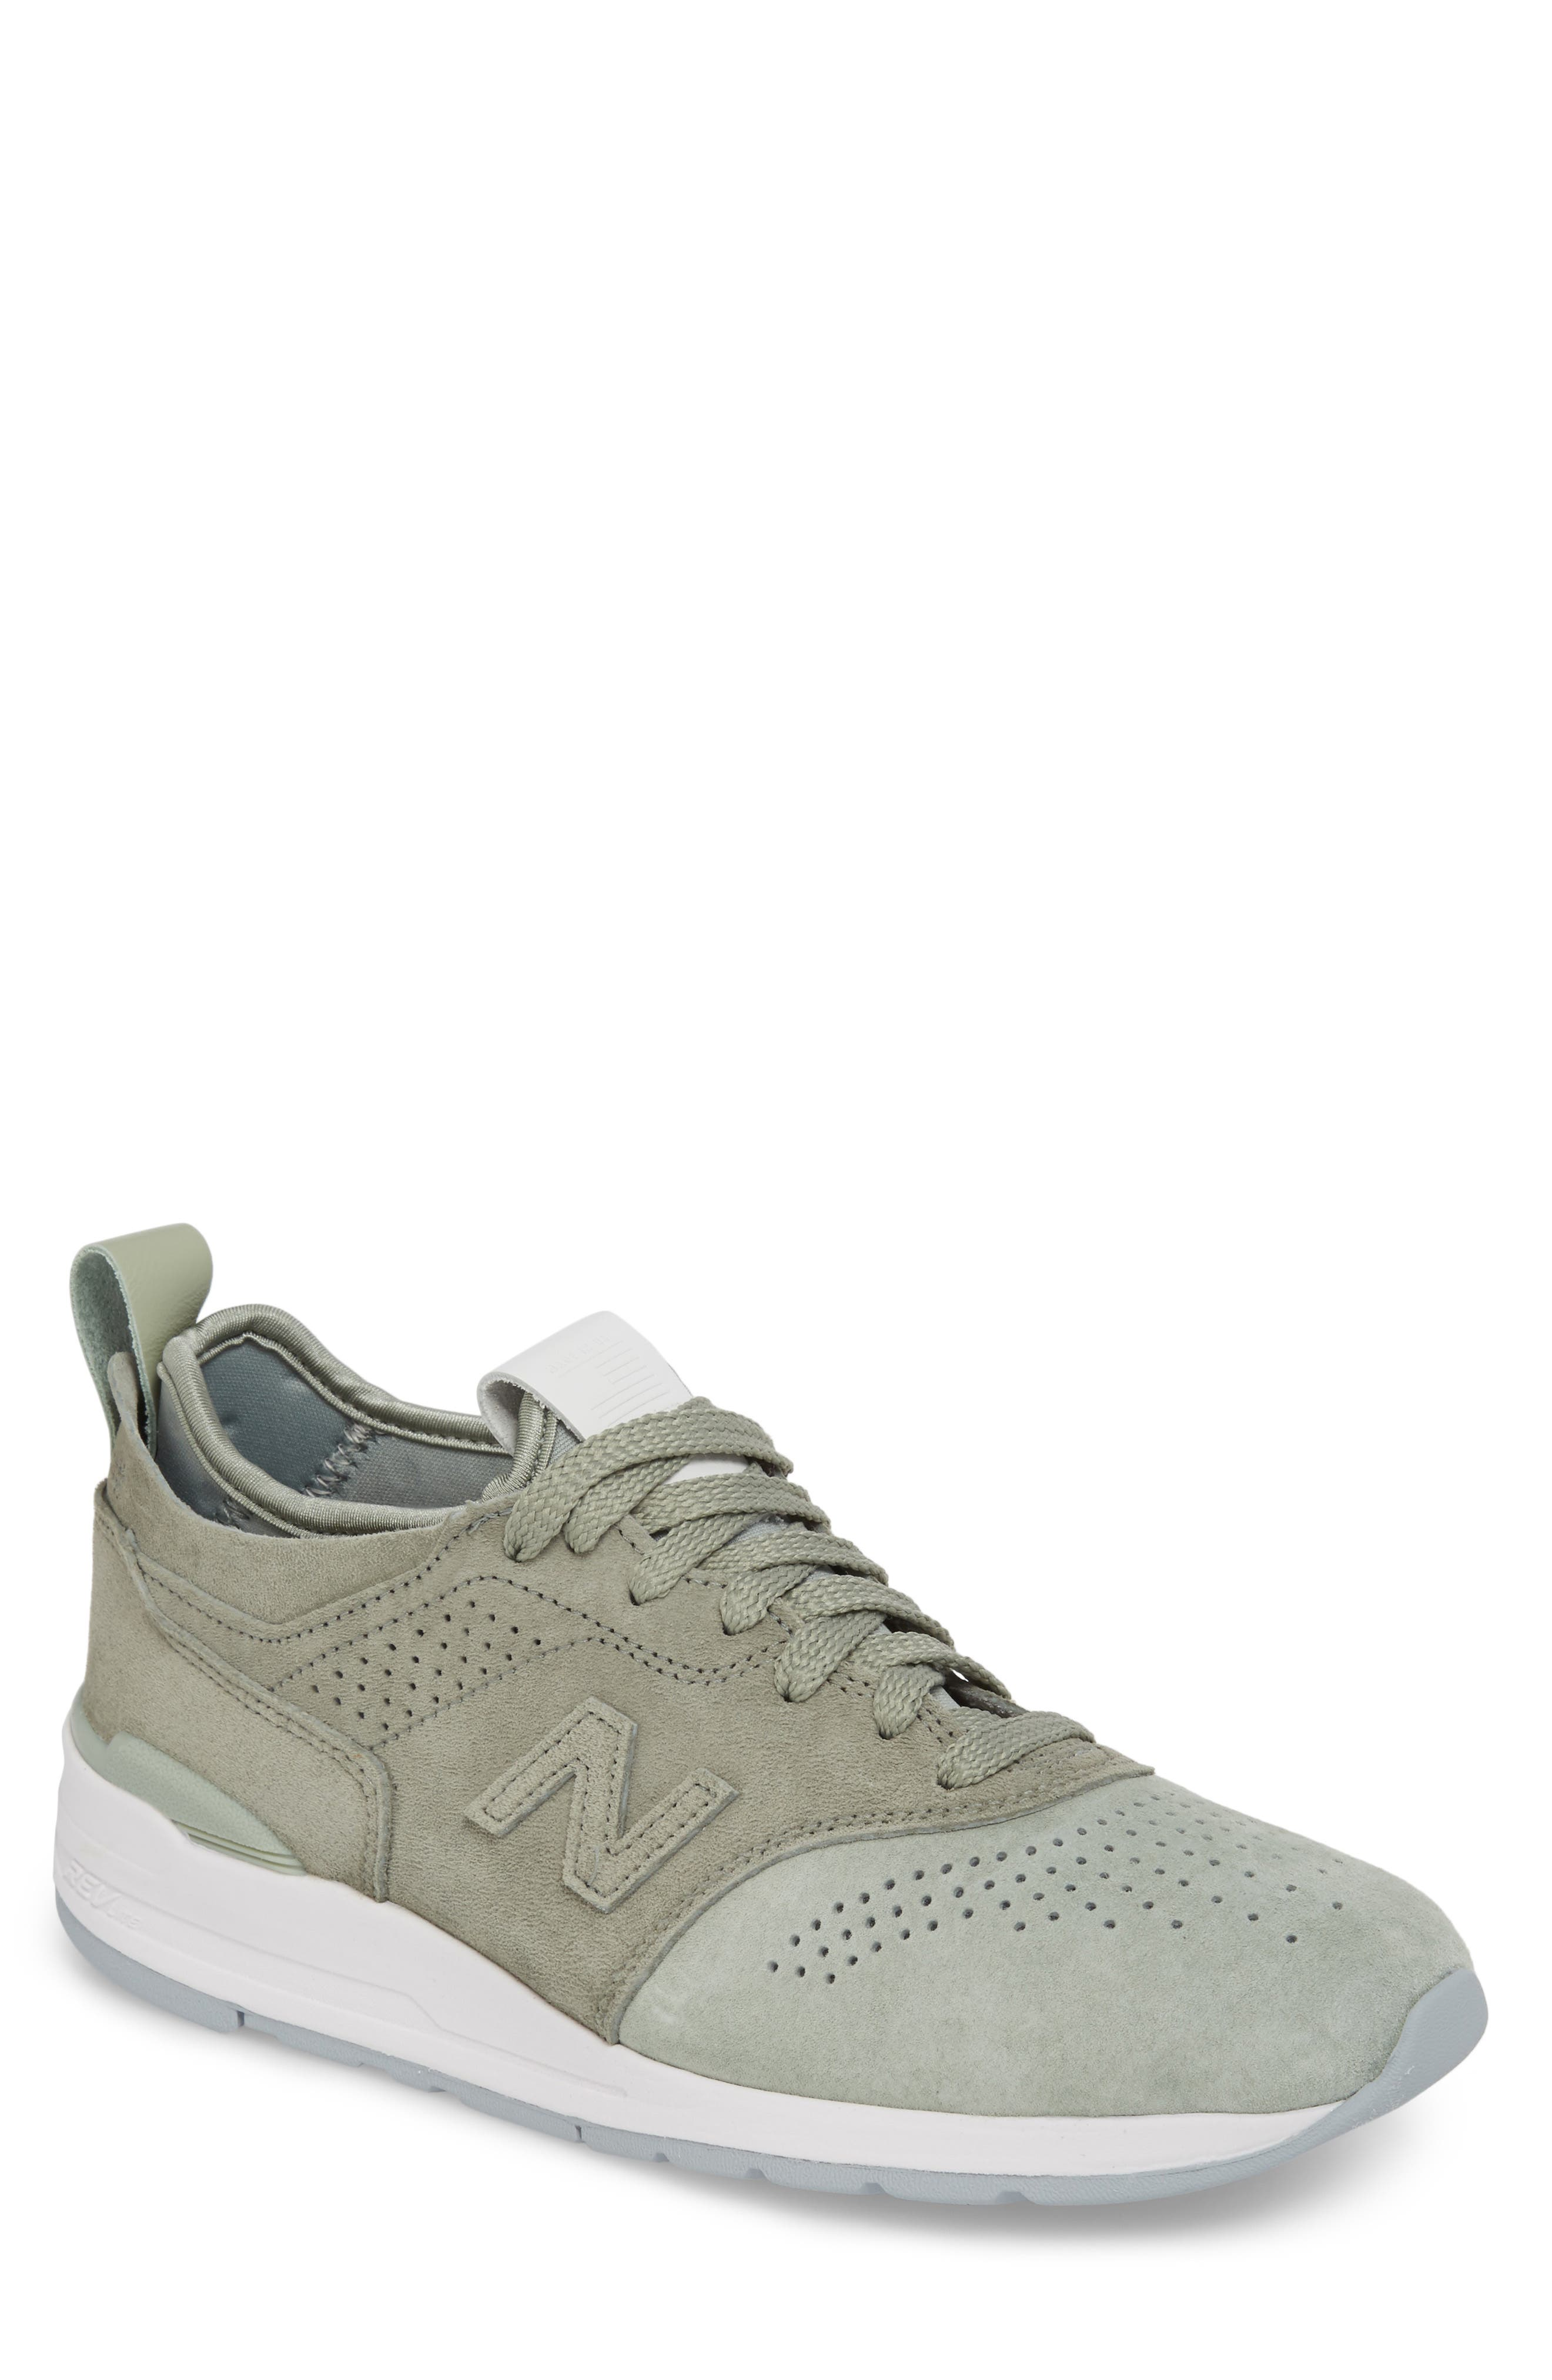 Main Image - New Balance 997R Perforated Sneaker (Men)